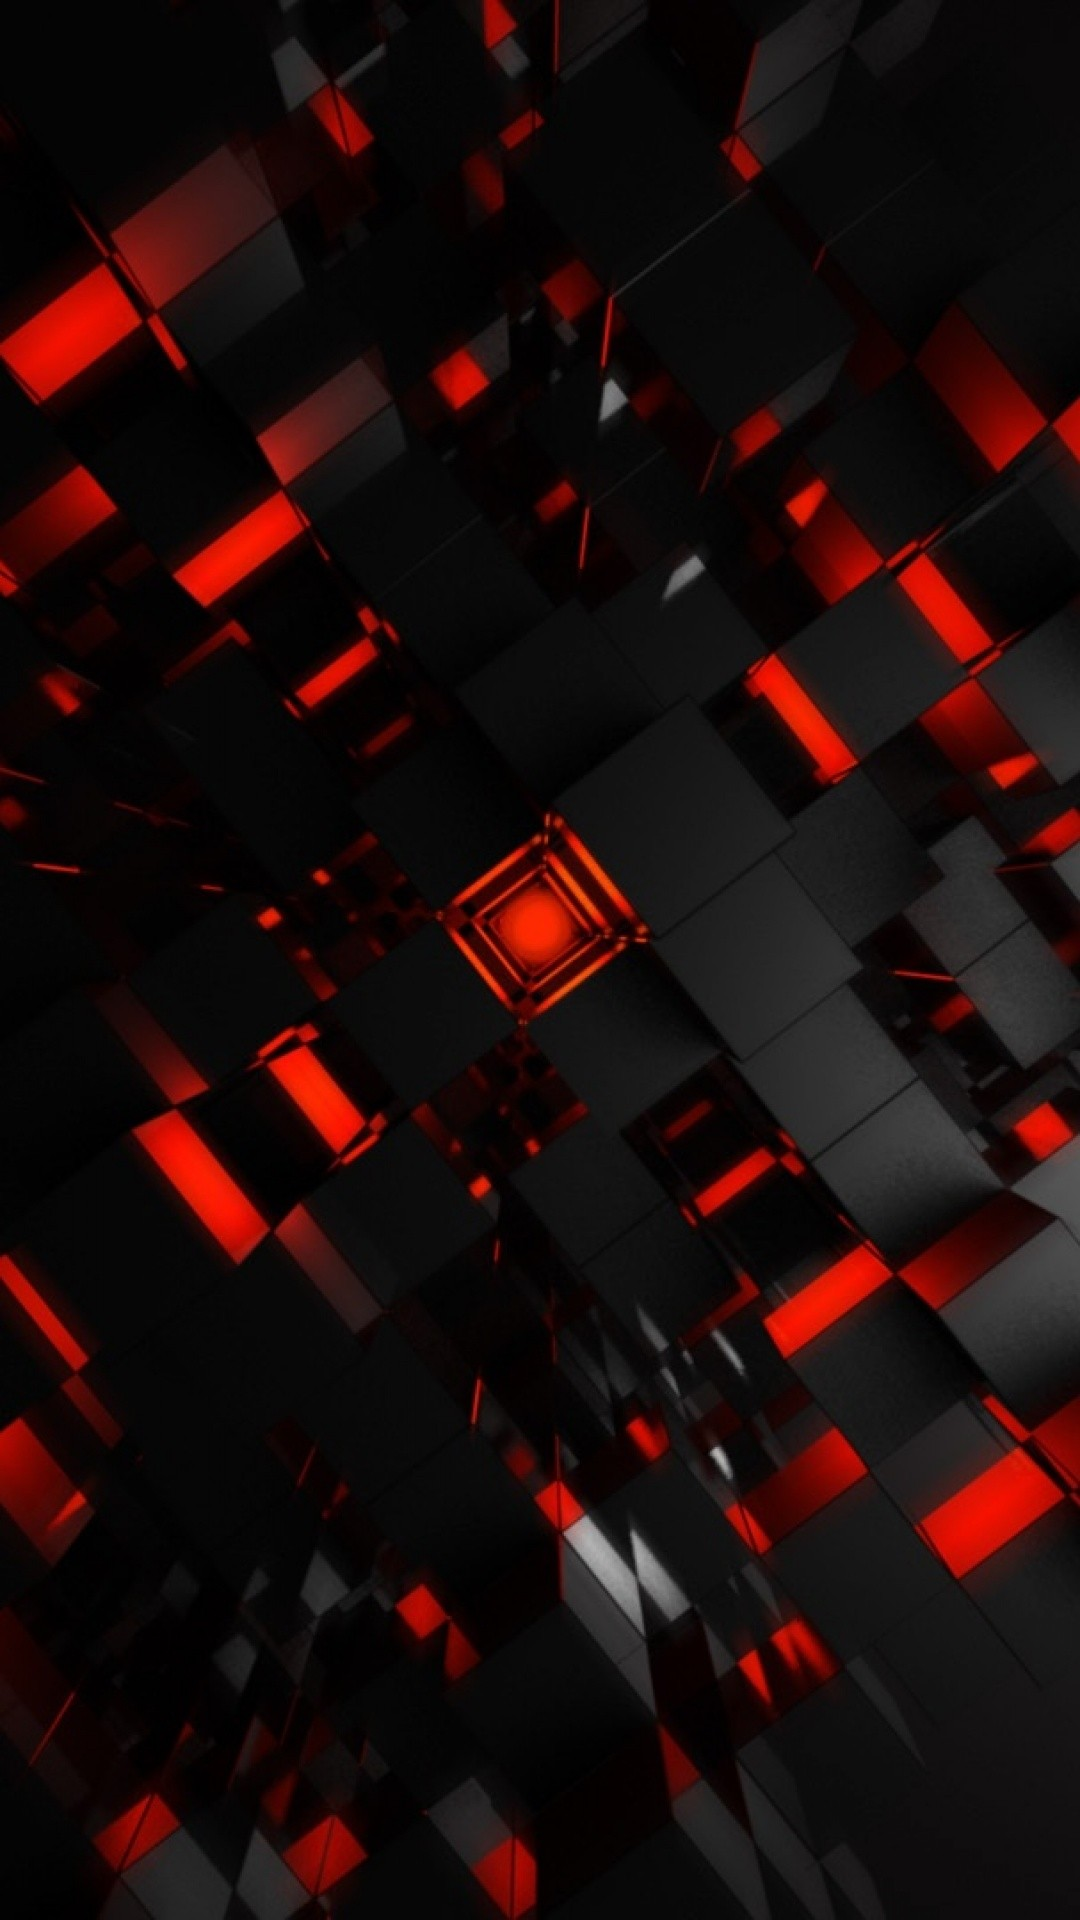 Matrix phone background